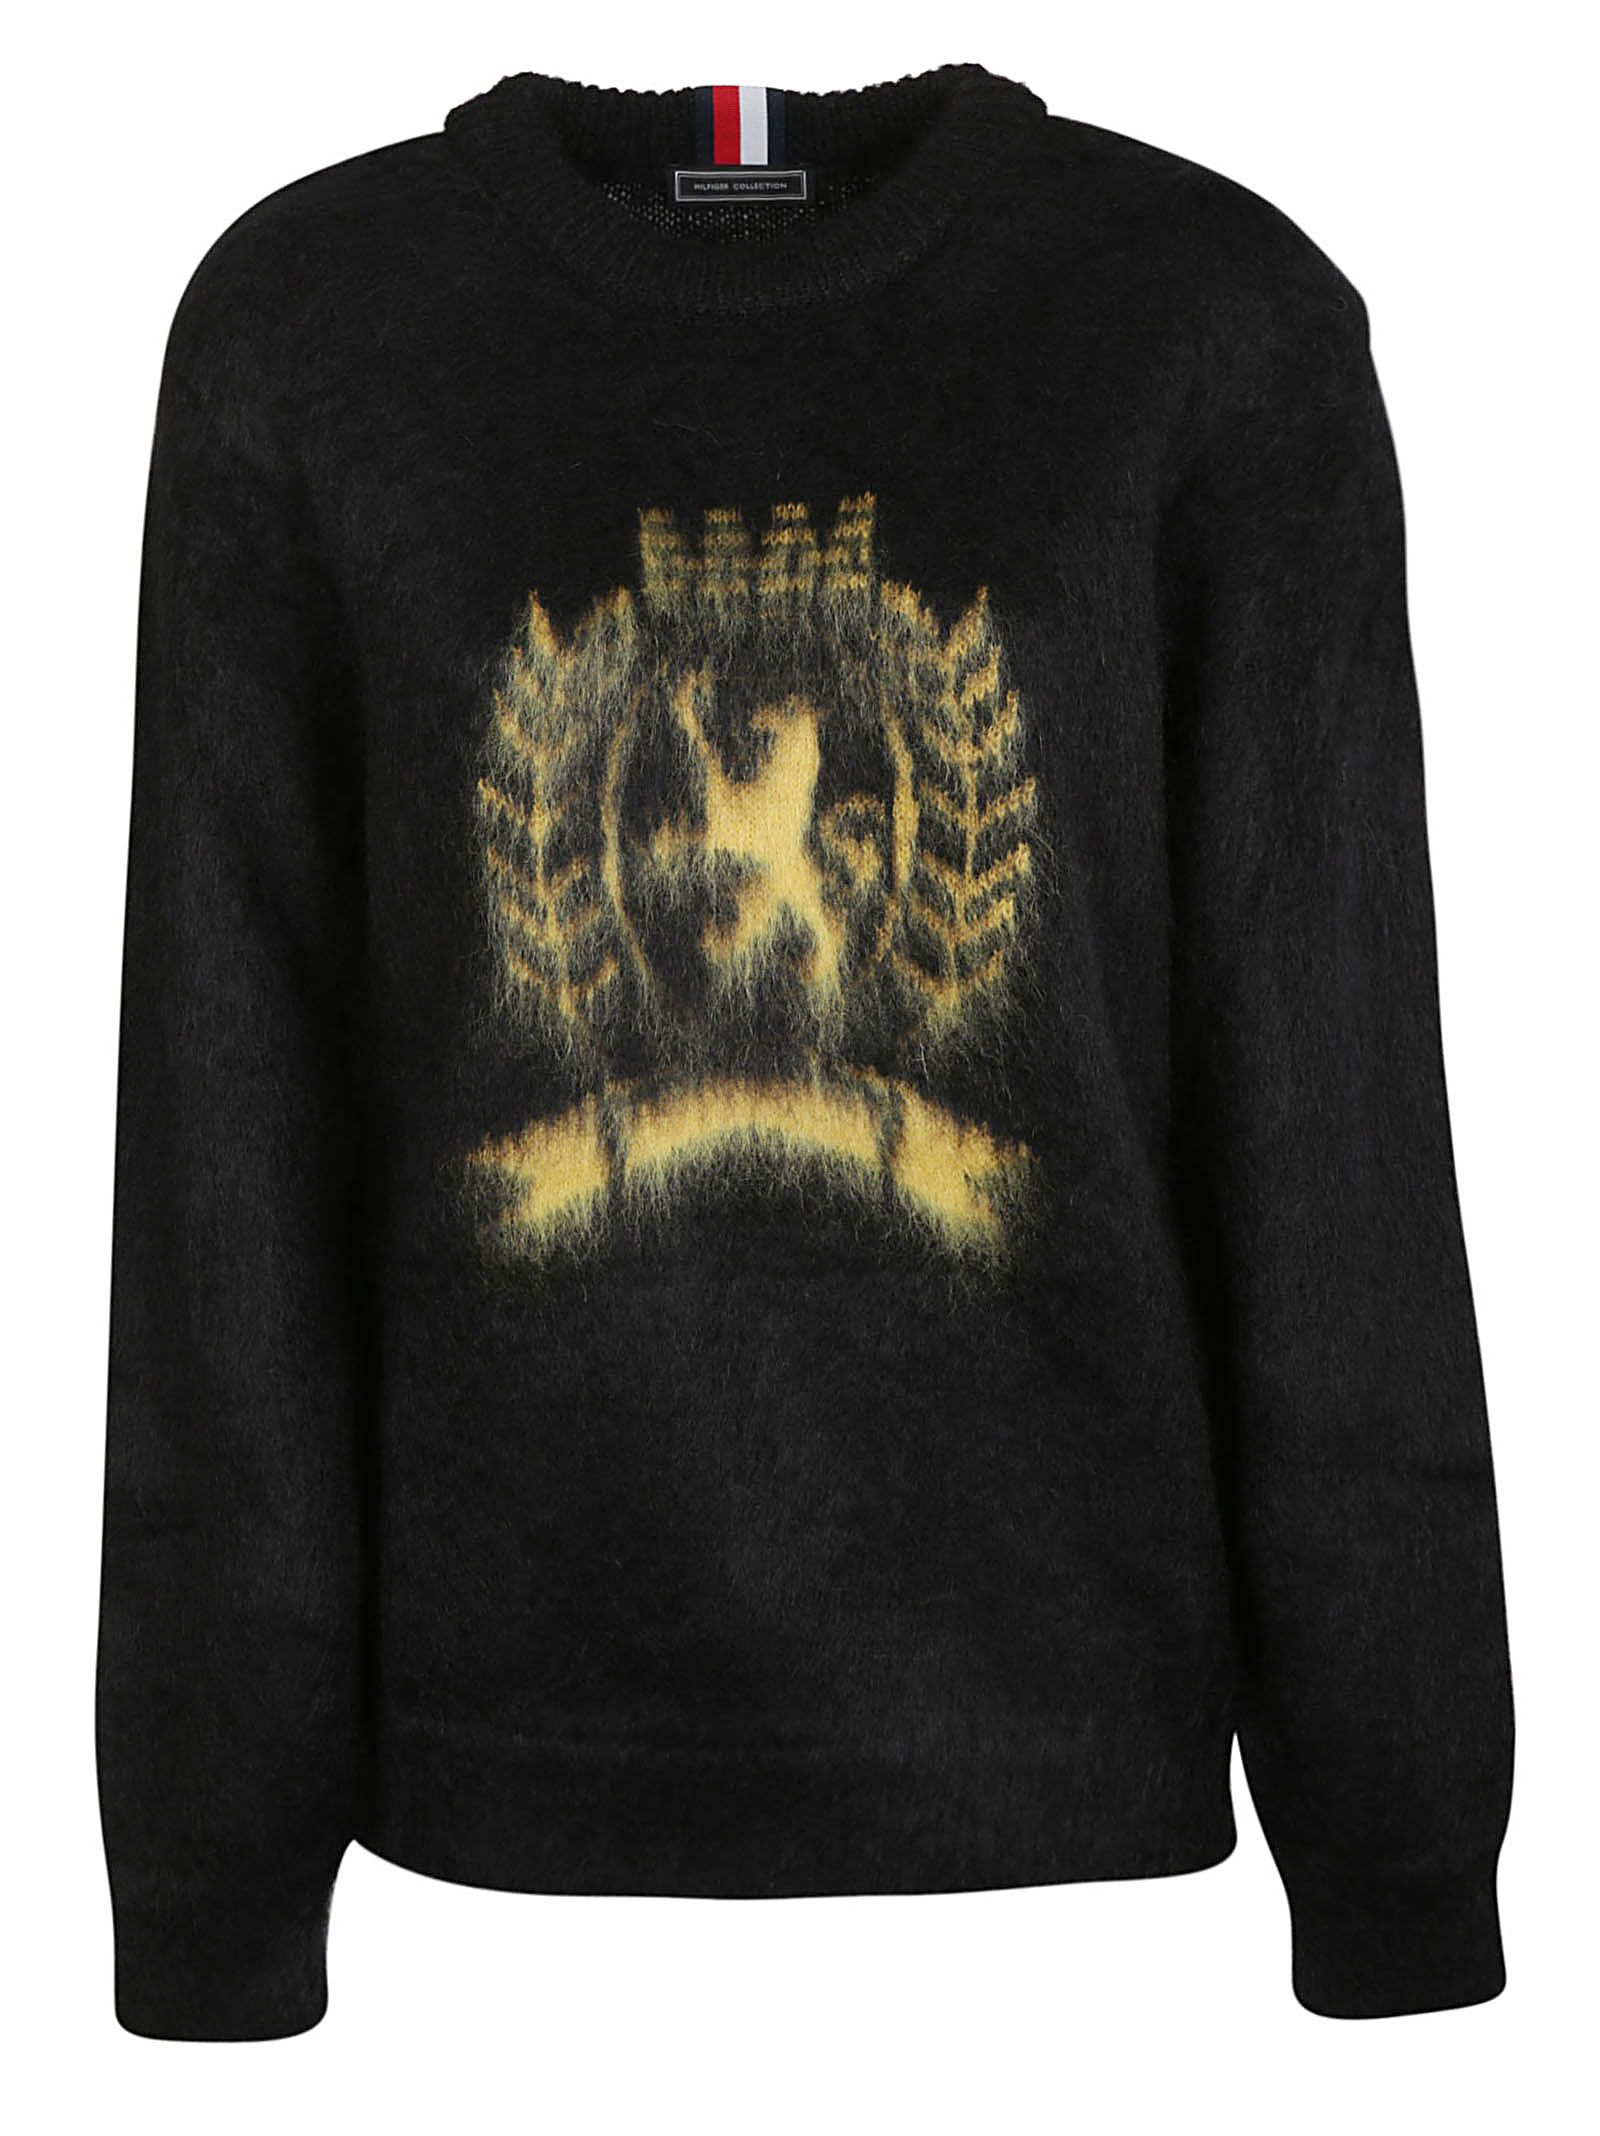 53a82137 Tommy Hilfiger Tommy Hilfiger Hc Crest Sweatshirt - Jet Black ...